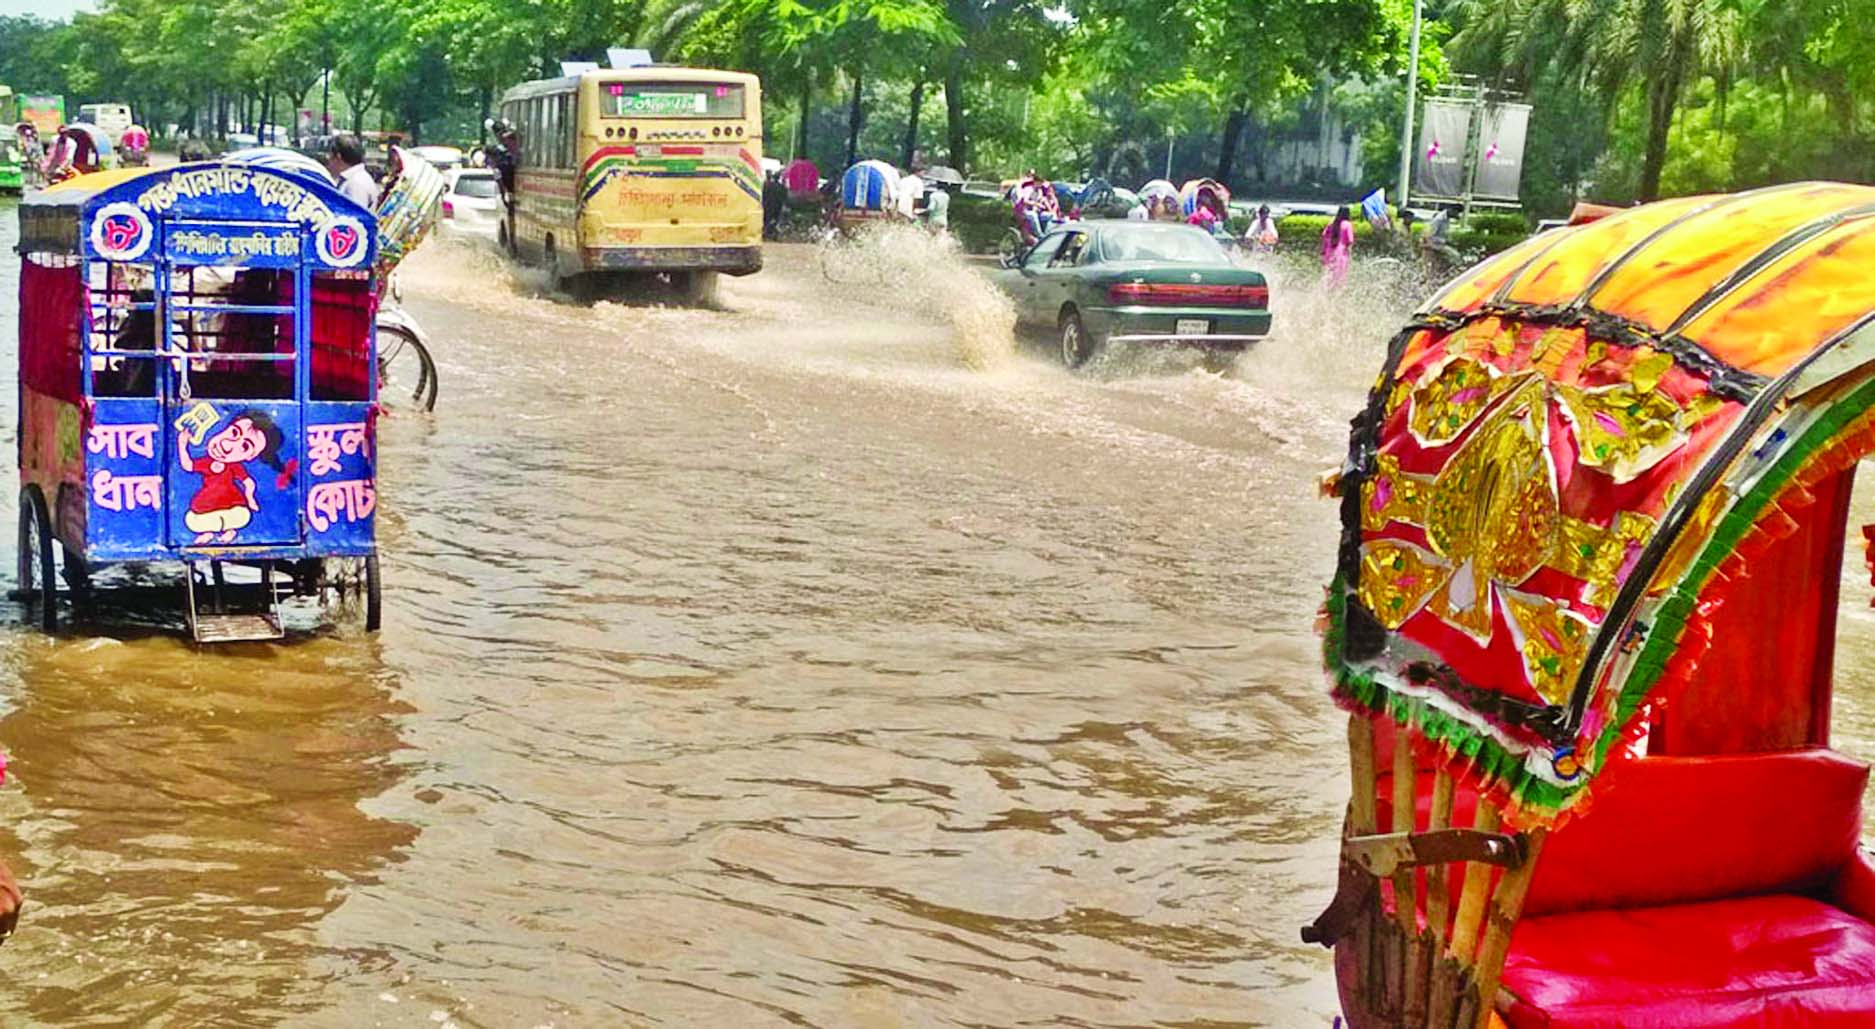 Rain causes traffic chaos in city